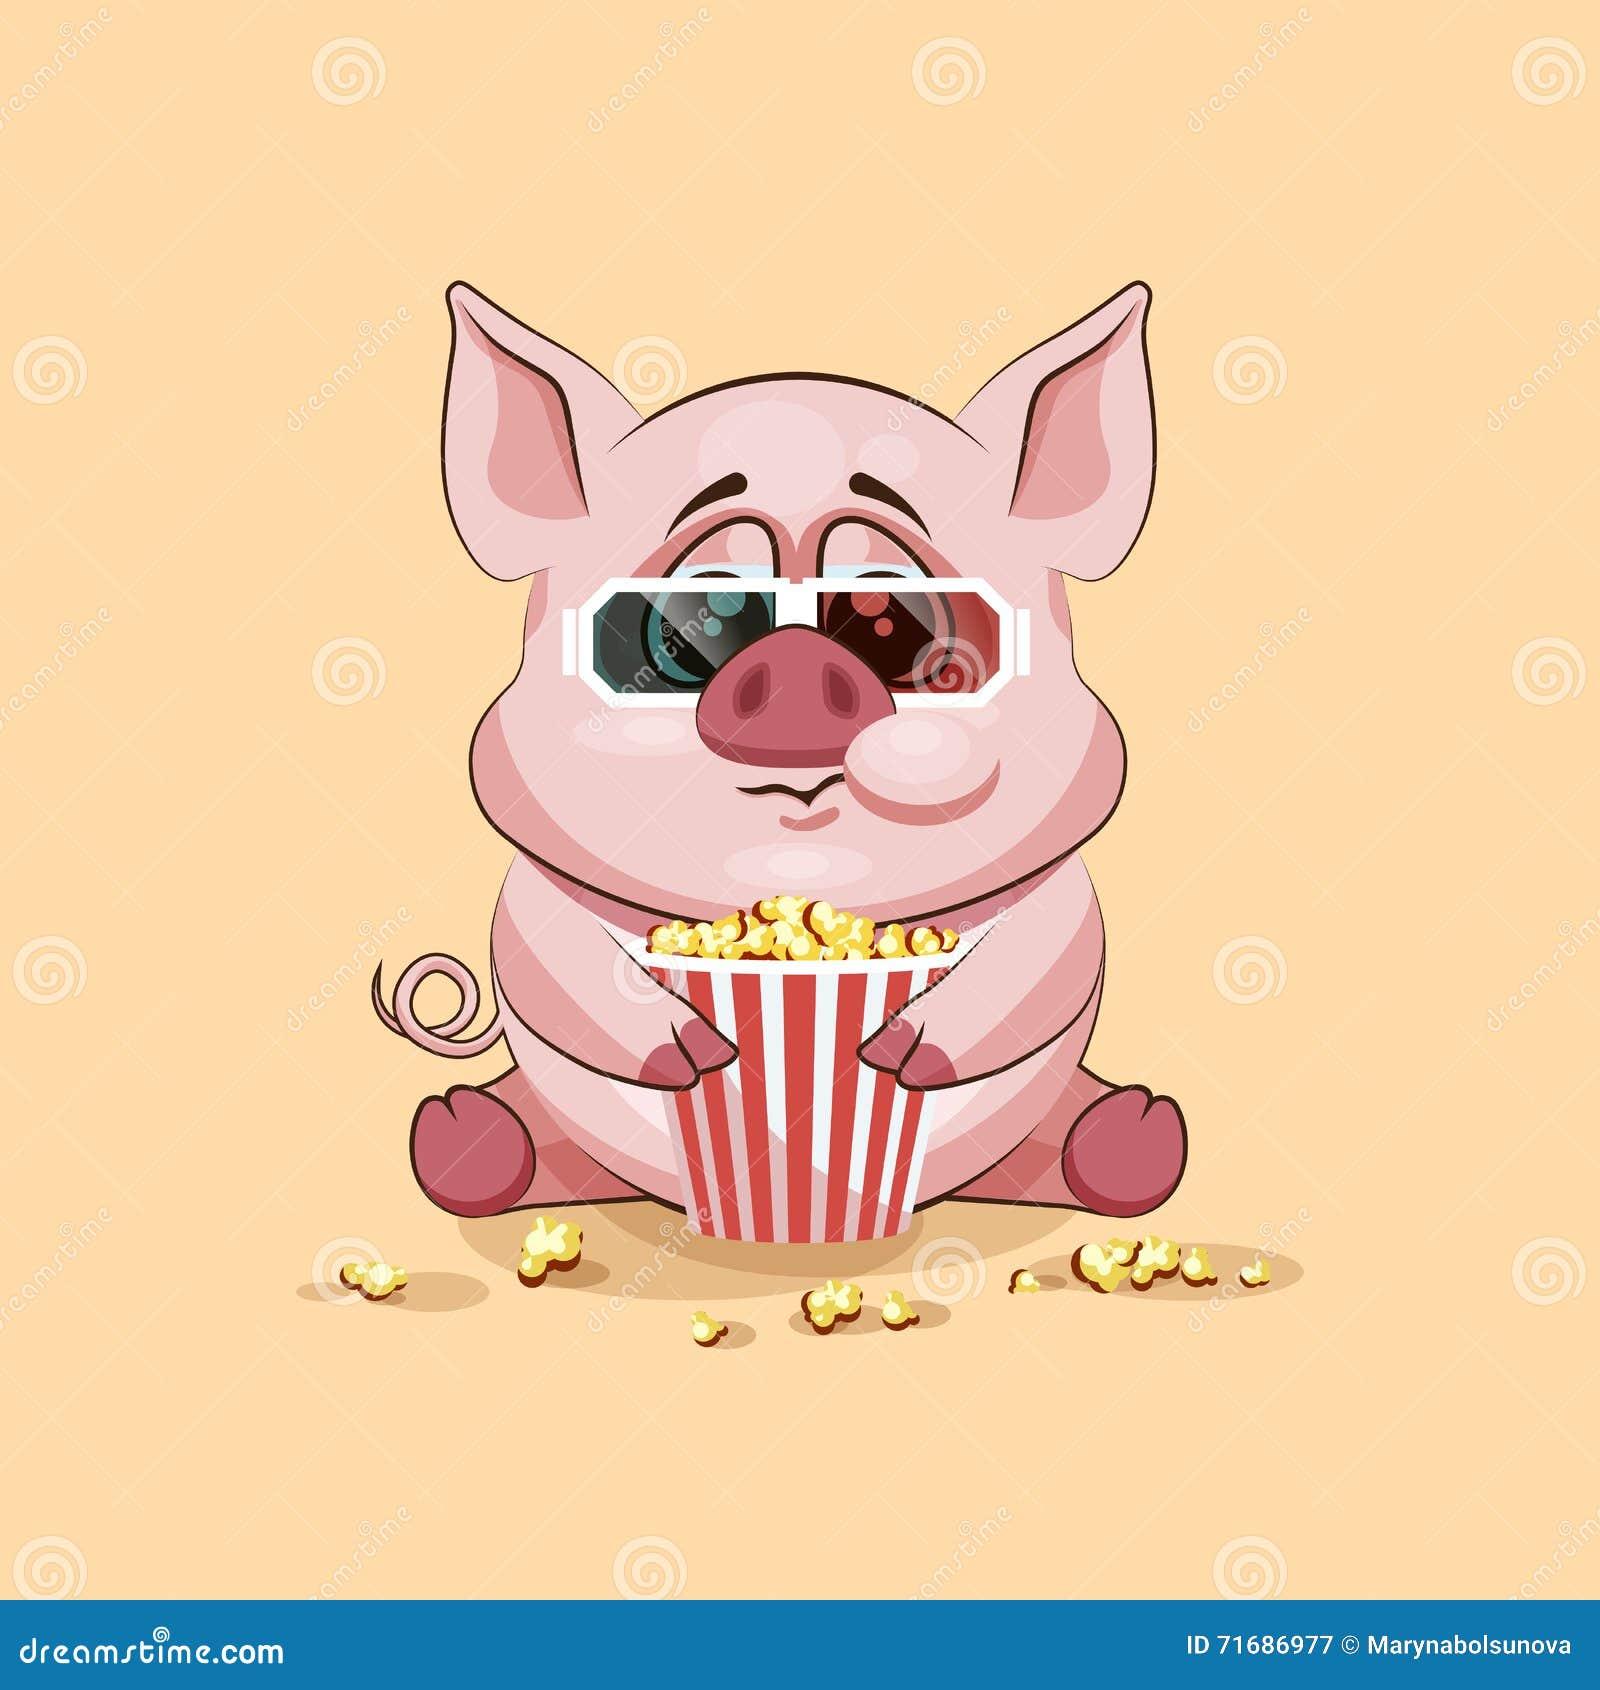 emoji character cartoon pig chewing popcorn watching